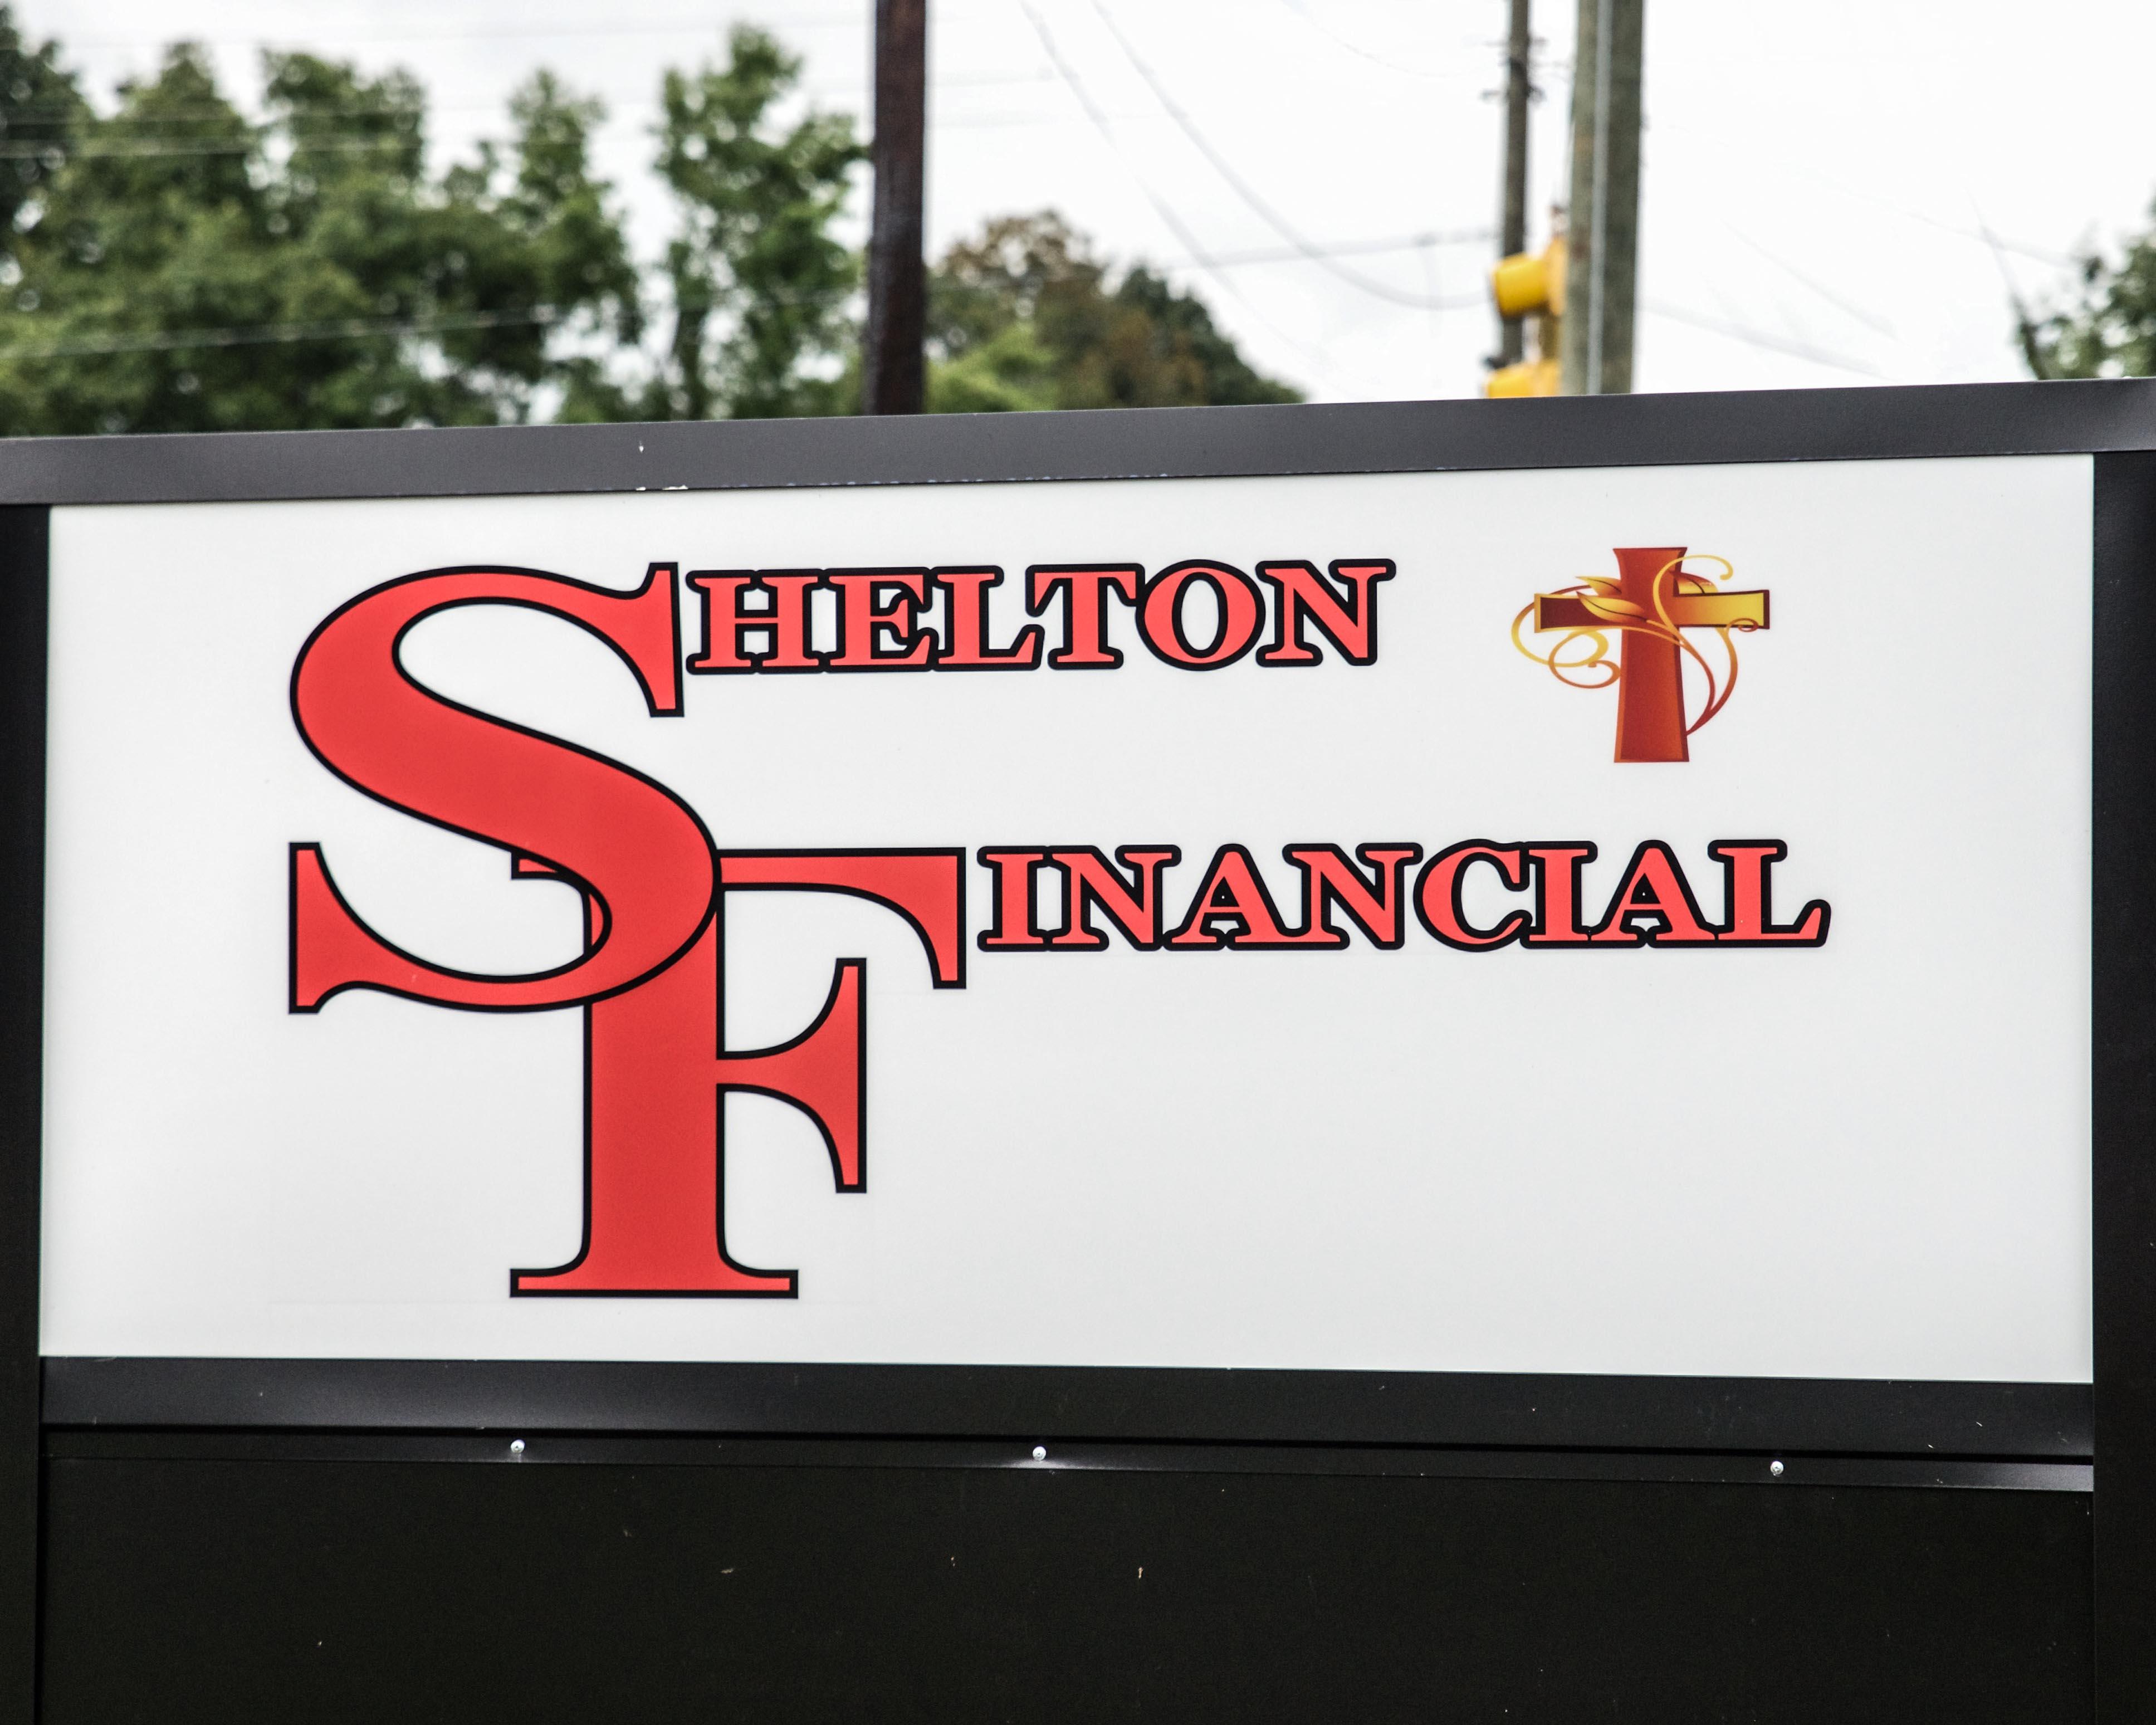 Shelton Financial